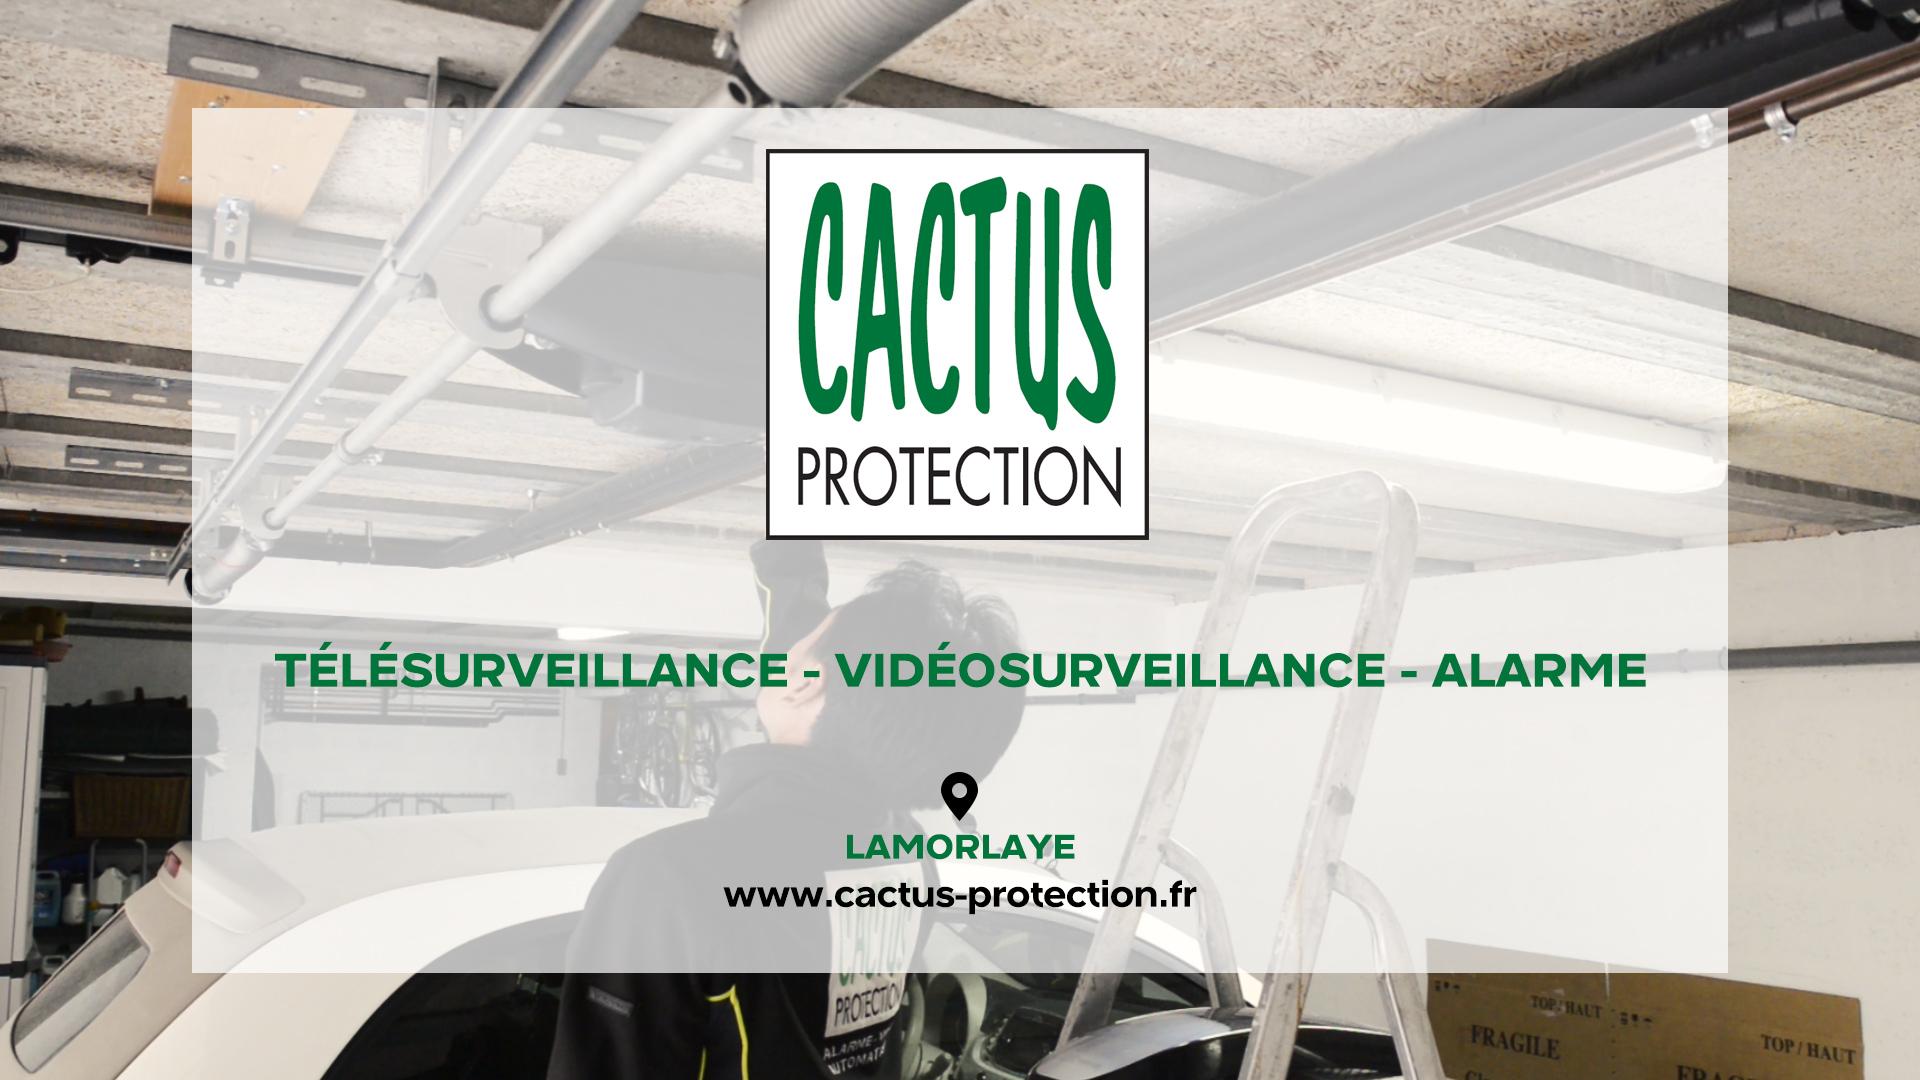 Cactus Protection - LAMORLAYE